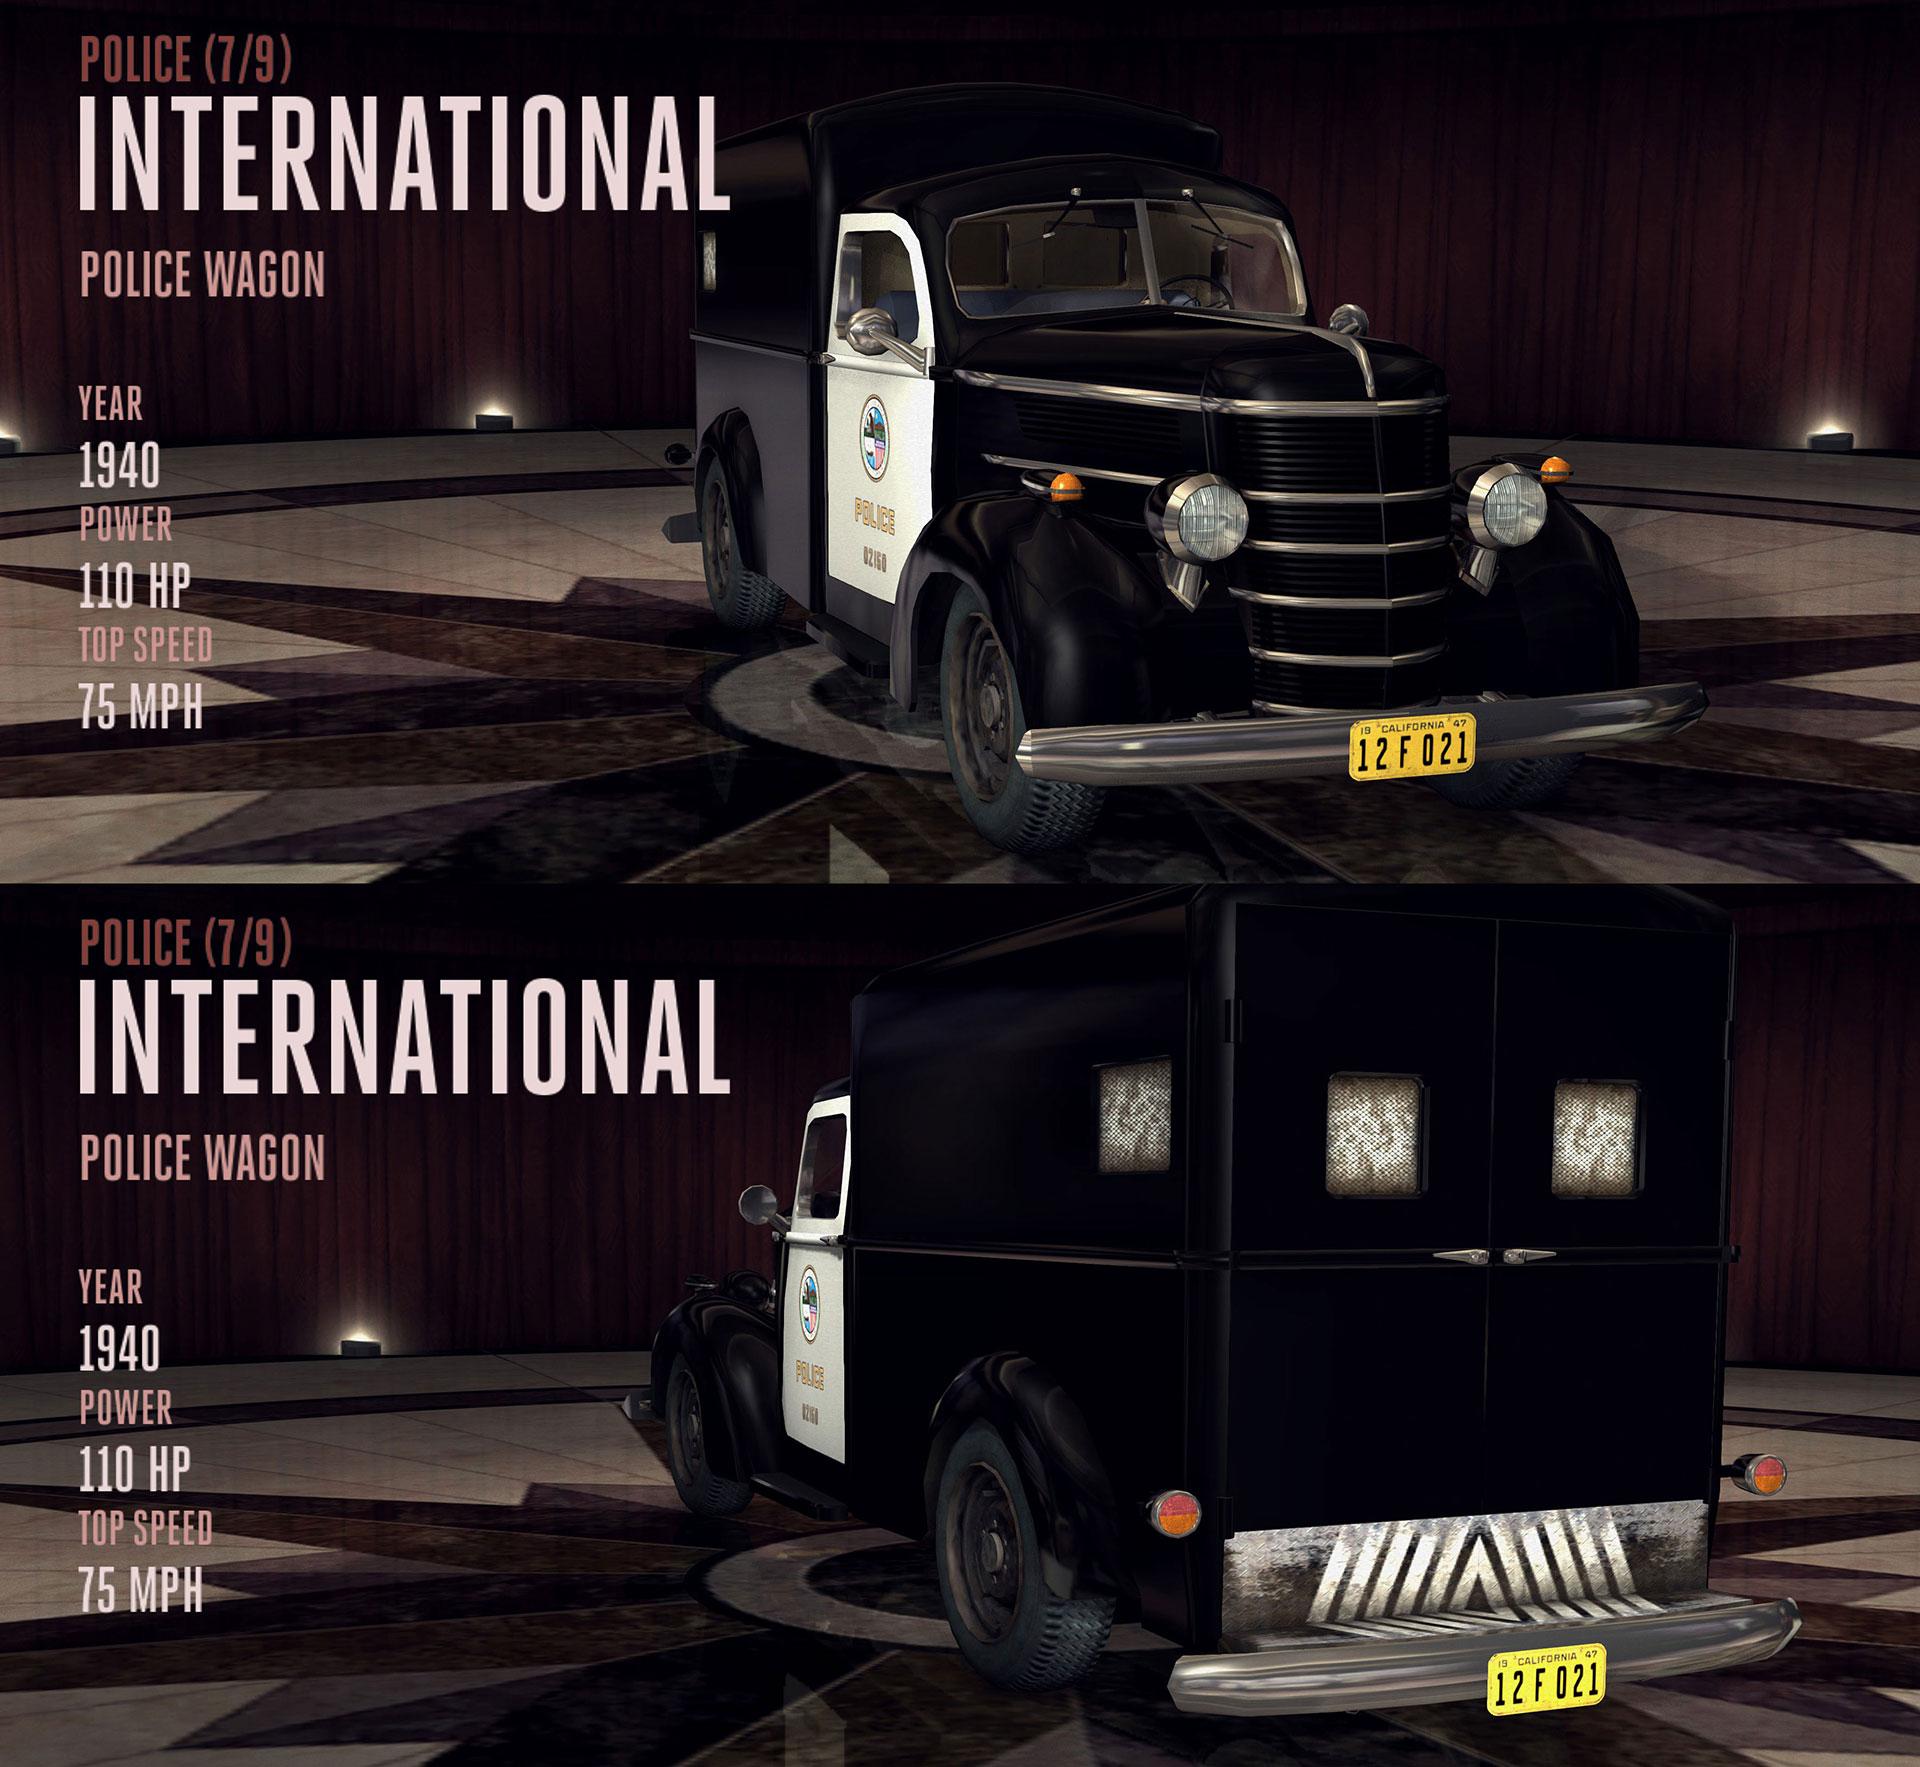 International Police Wagon